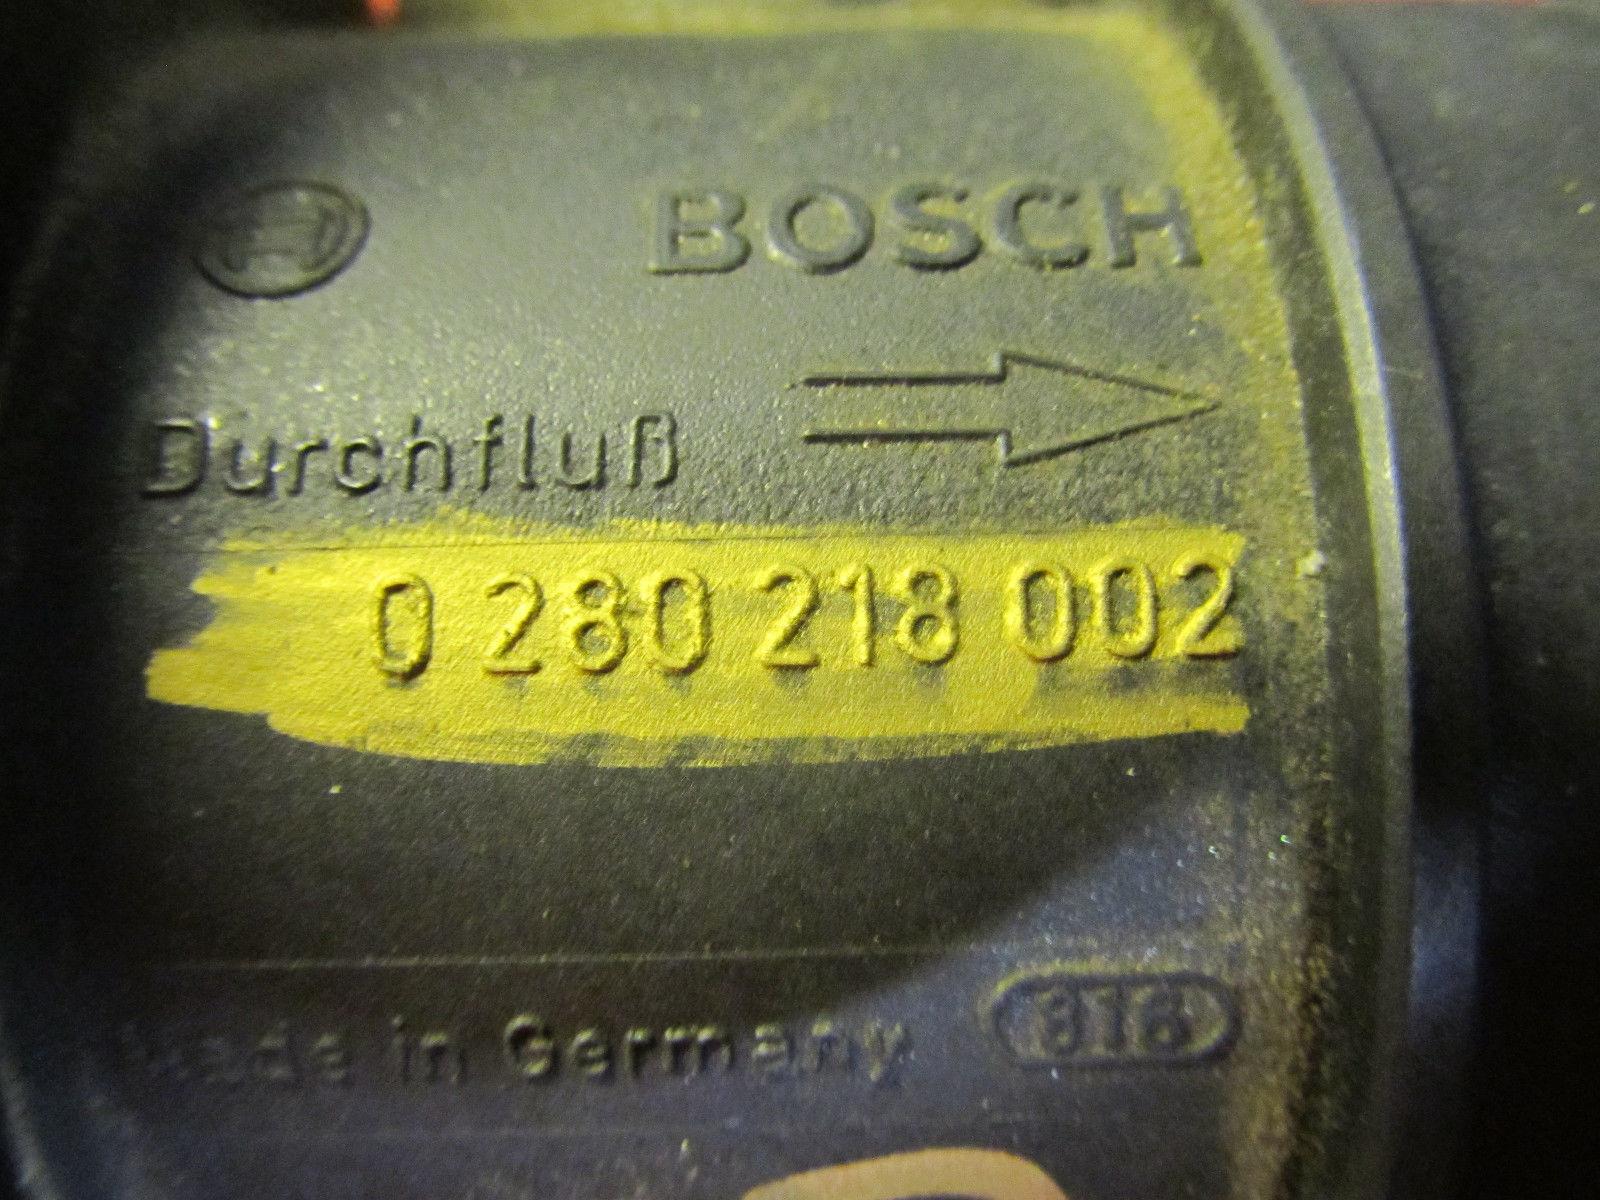 98 01 00 99 VW bug Beetle jetta golf oem 2.0 mass air flow sensor 0280218002